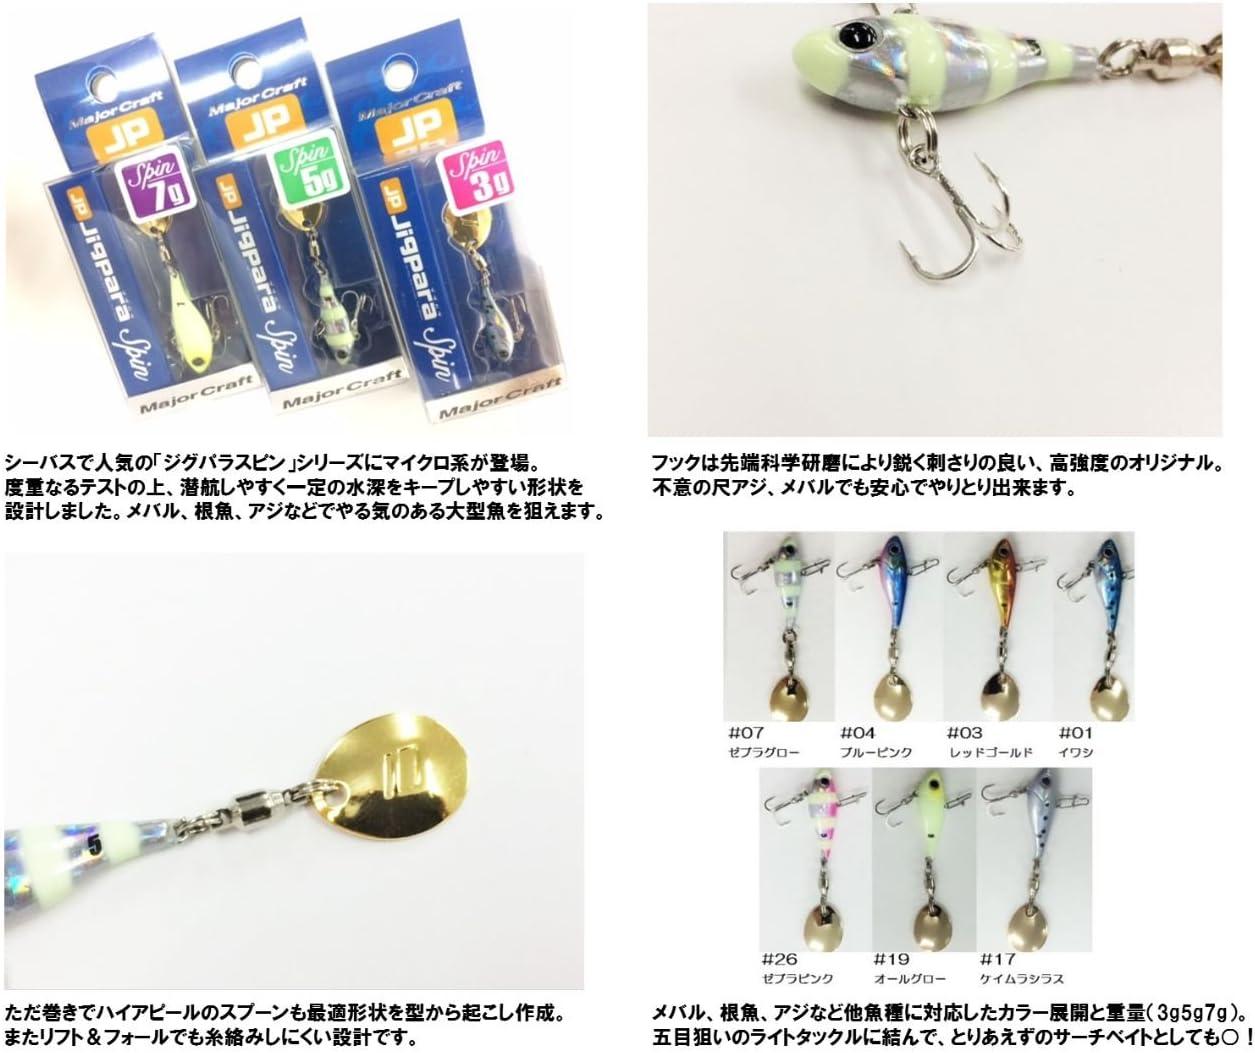 Major craft 18g 1 sardine JPSPIN-18g lure metal jig Jigupara spin JAPAN